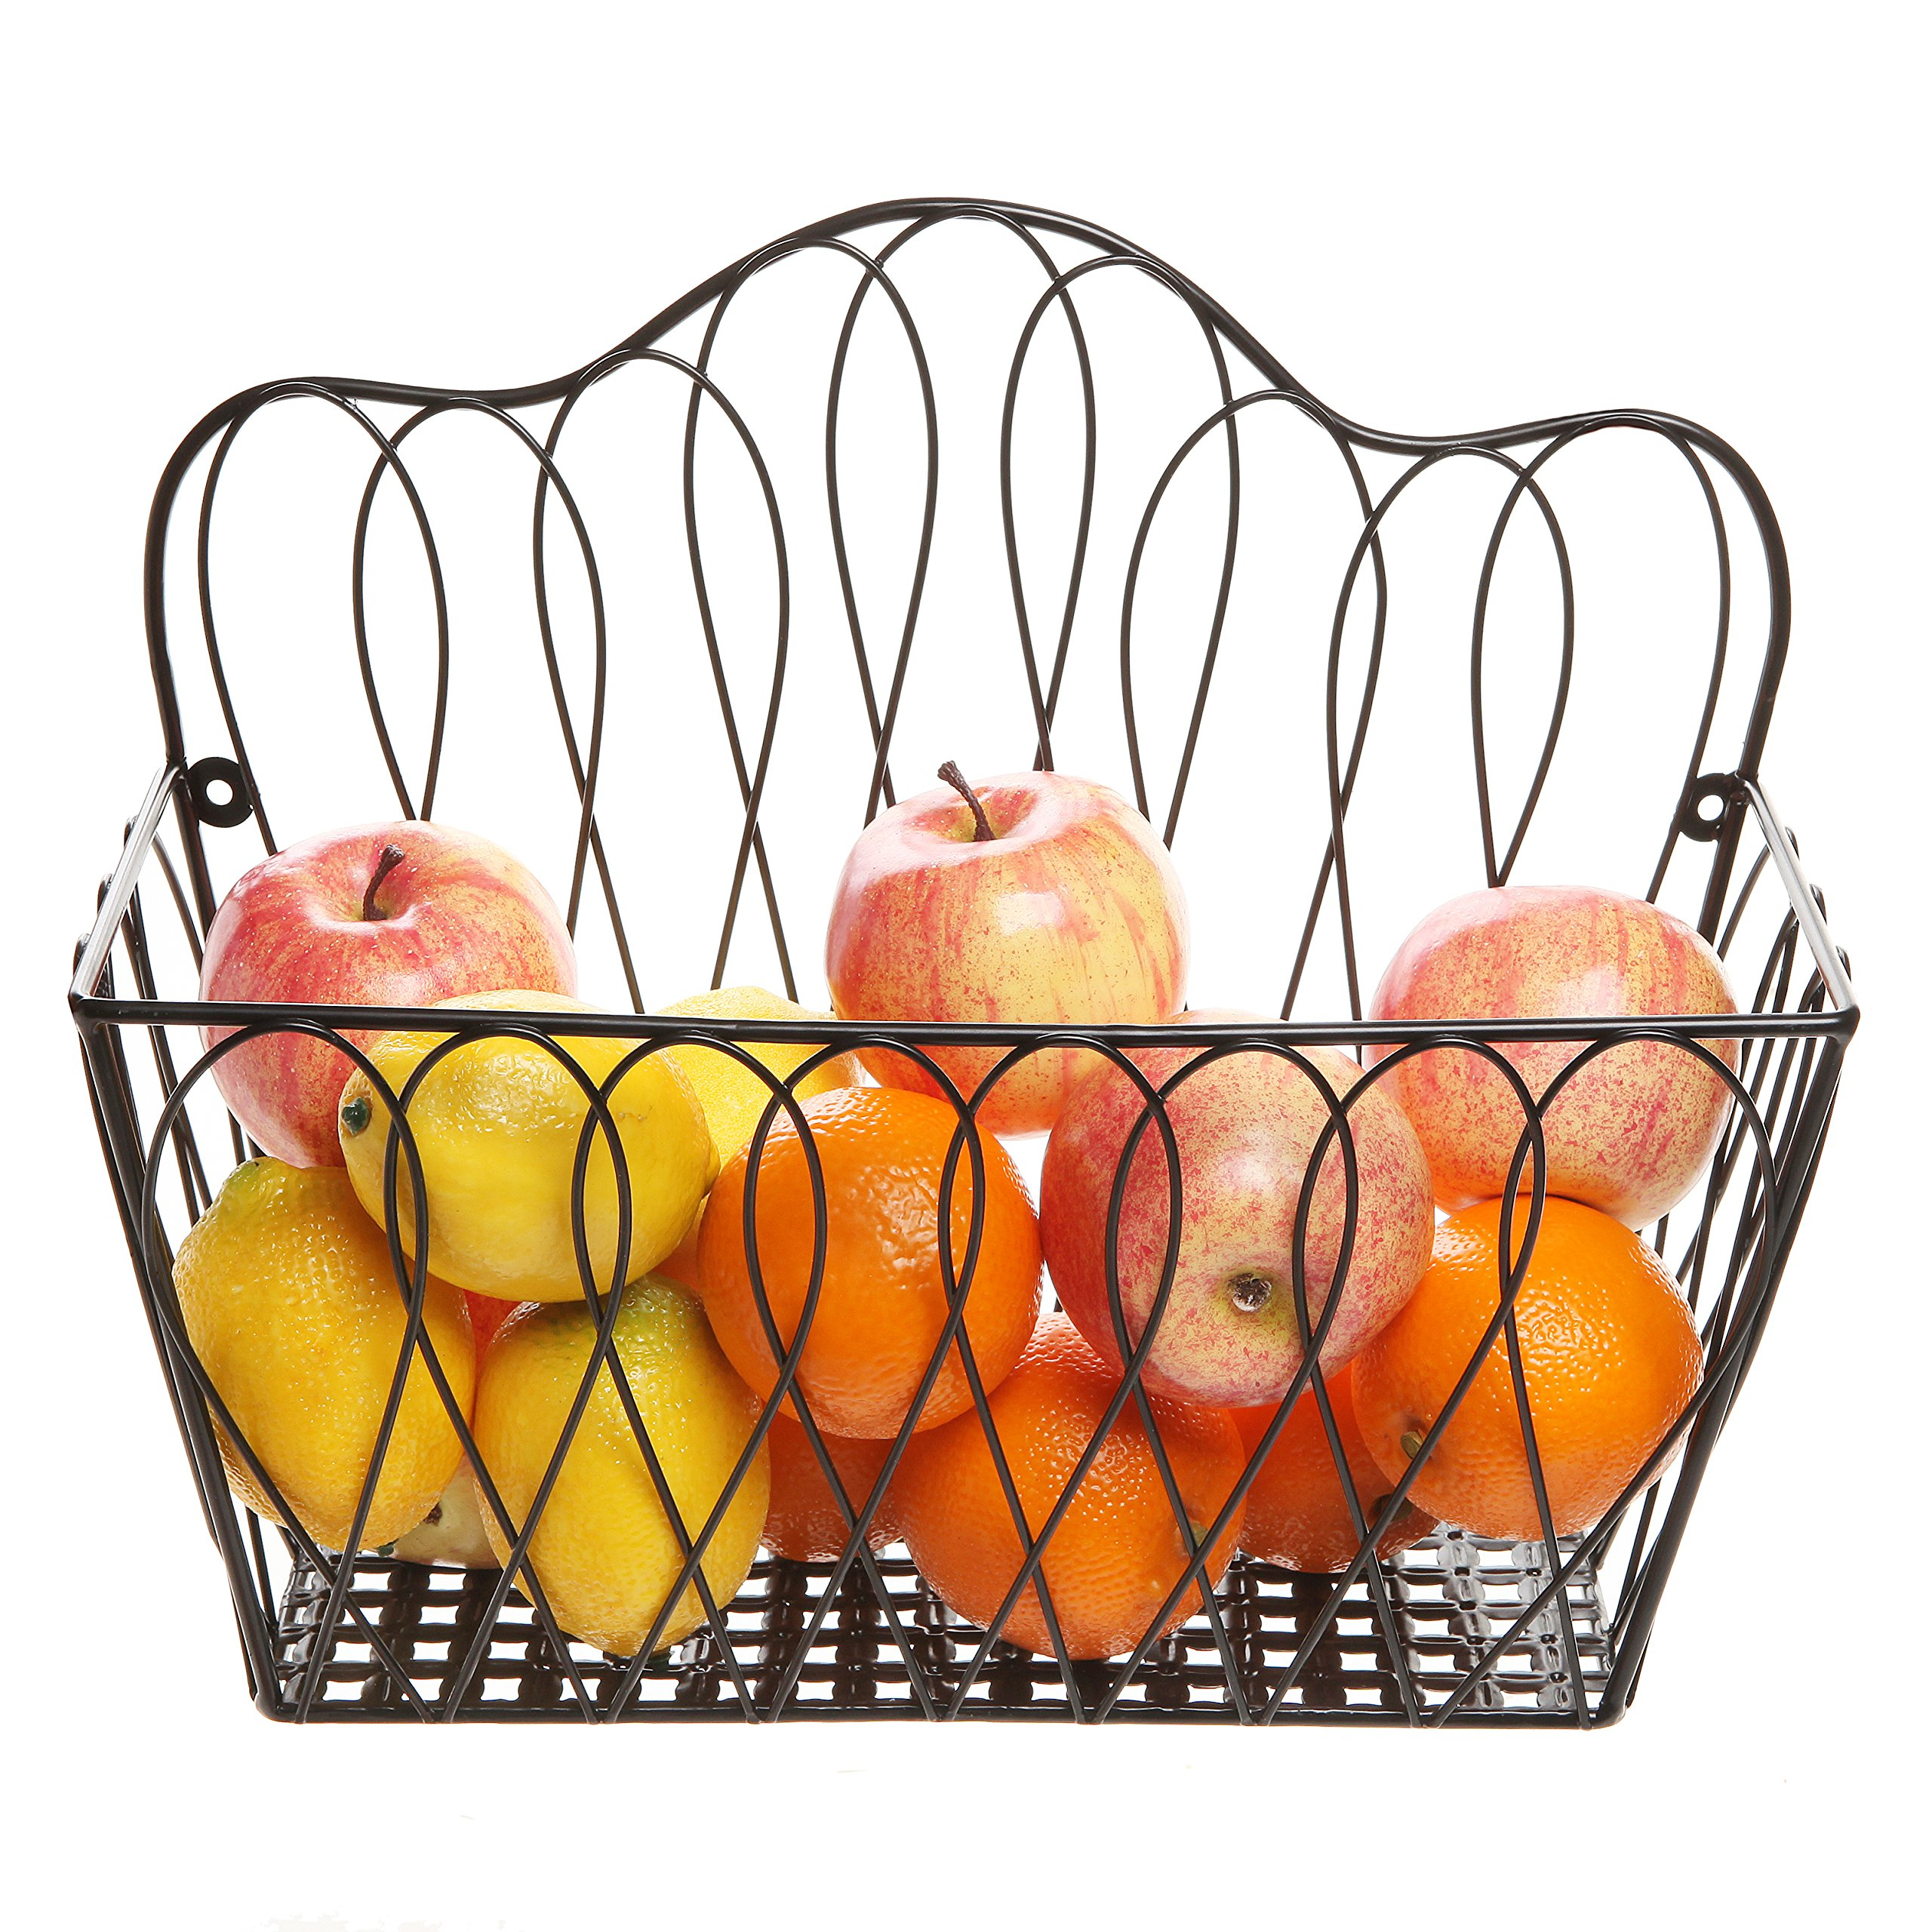 MyGift Decorative Black Metal Wire Loop Design Wall Mounted Magazine Holder Bin/Fruit Basket Rack